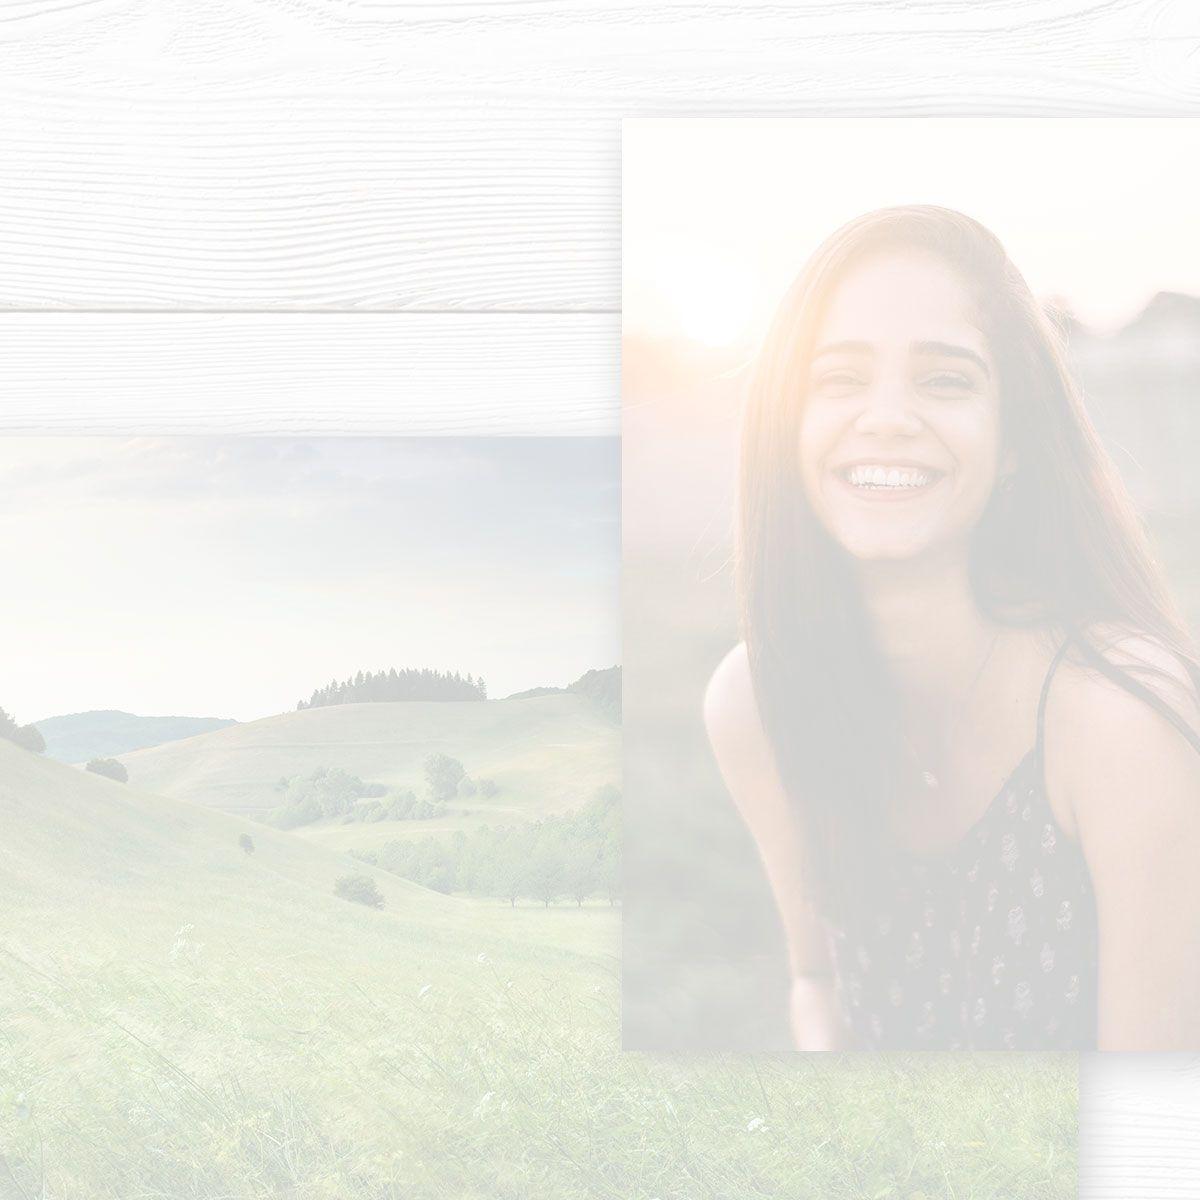 Light Collage Theme